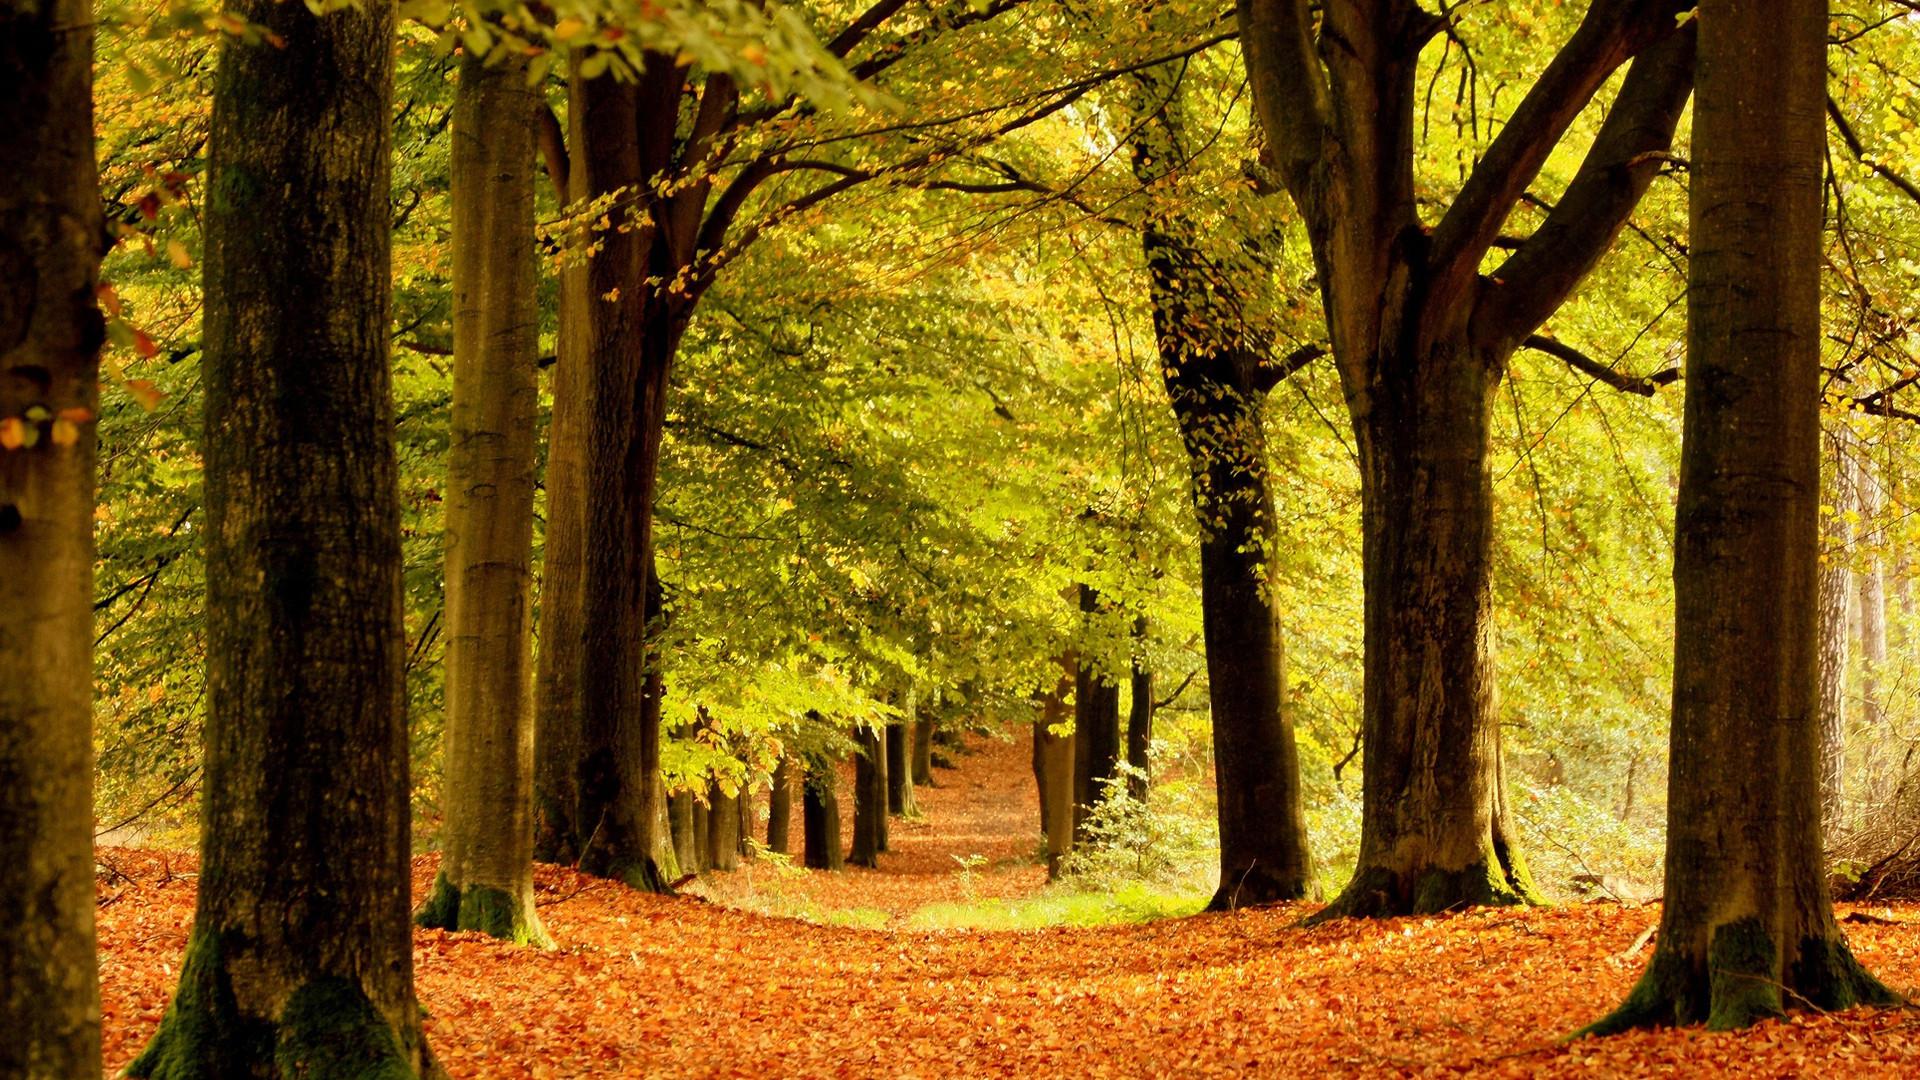 Hd Beautiful Forest Fall Leaf Autumn Wallpaper   Free Wallpaperd